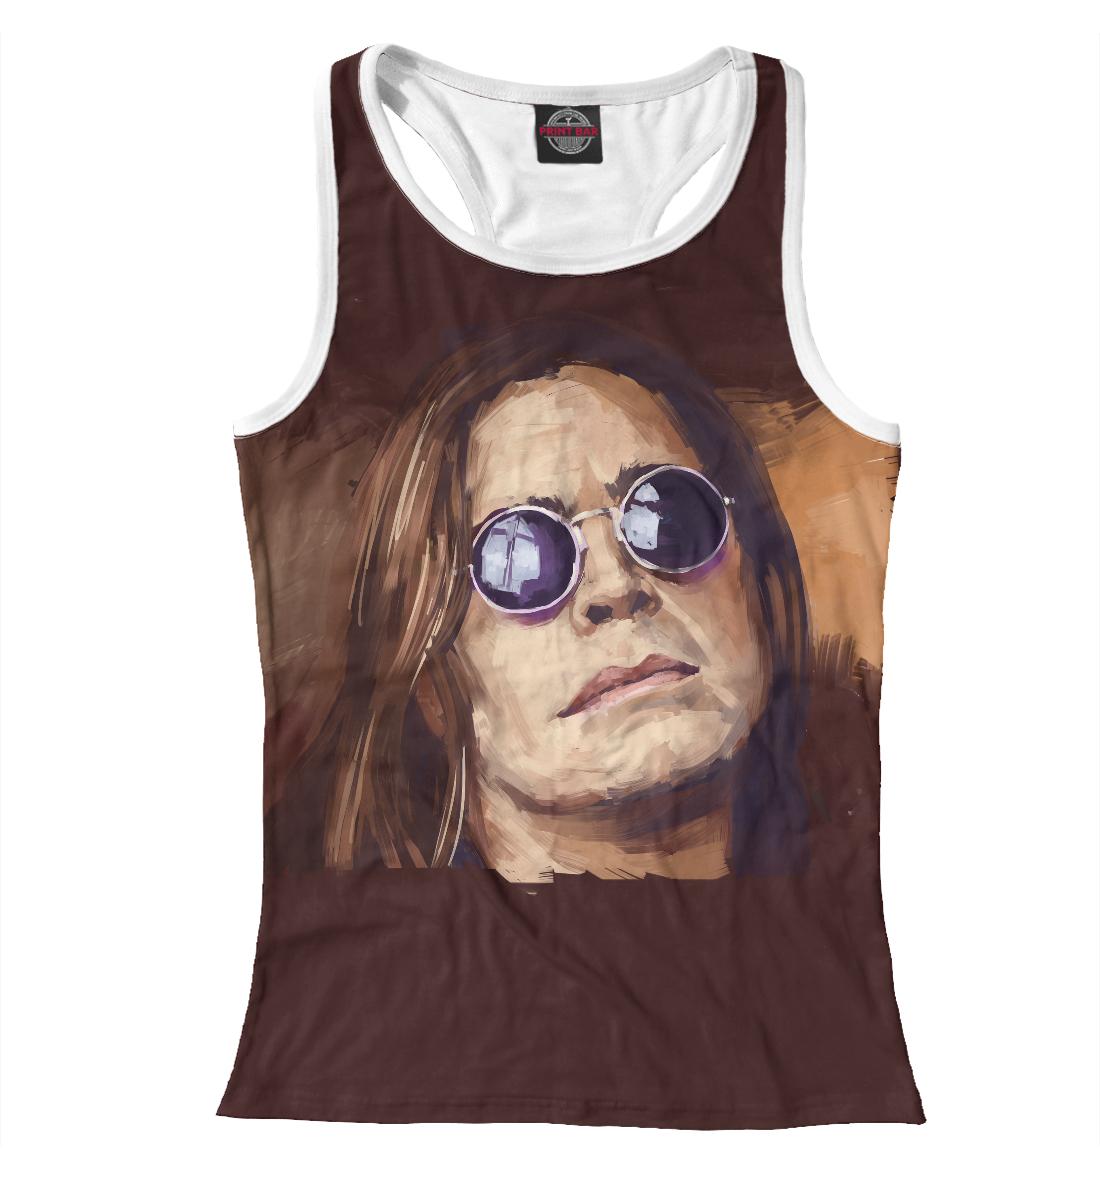 Купить Ozzy Osbourne, Printbar, Майки борцовки, OZO-770528-mayb-1